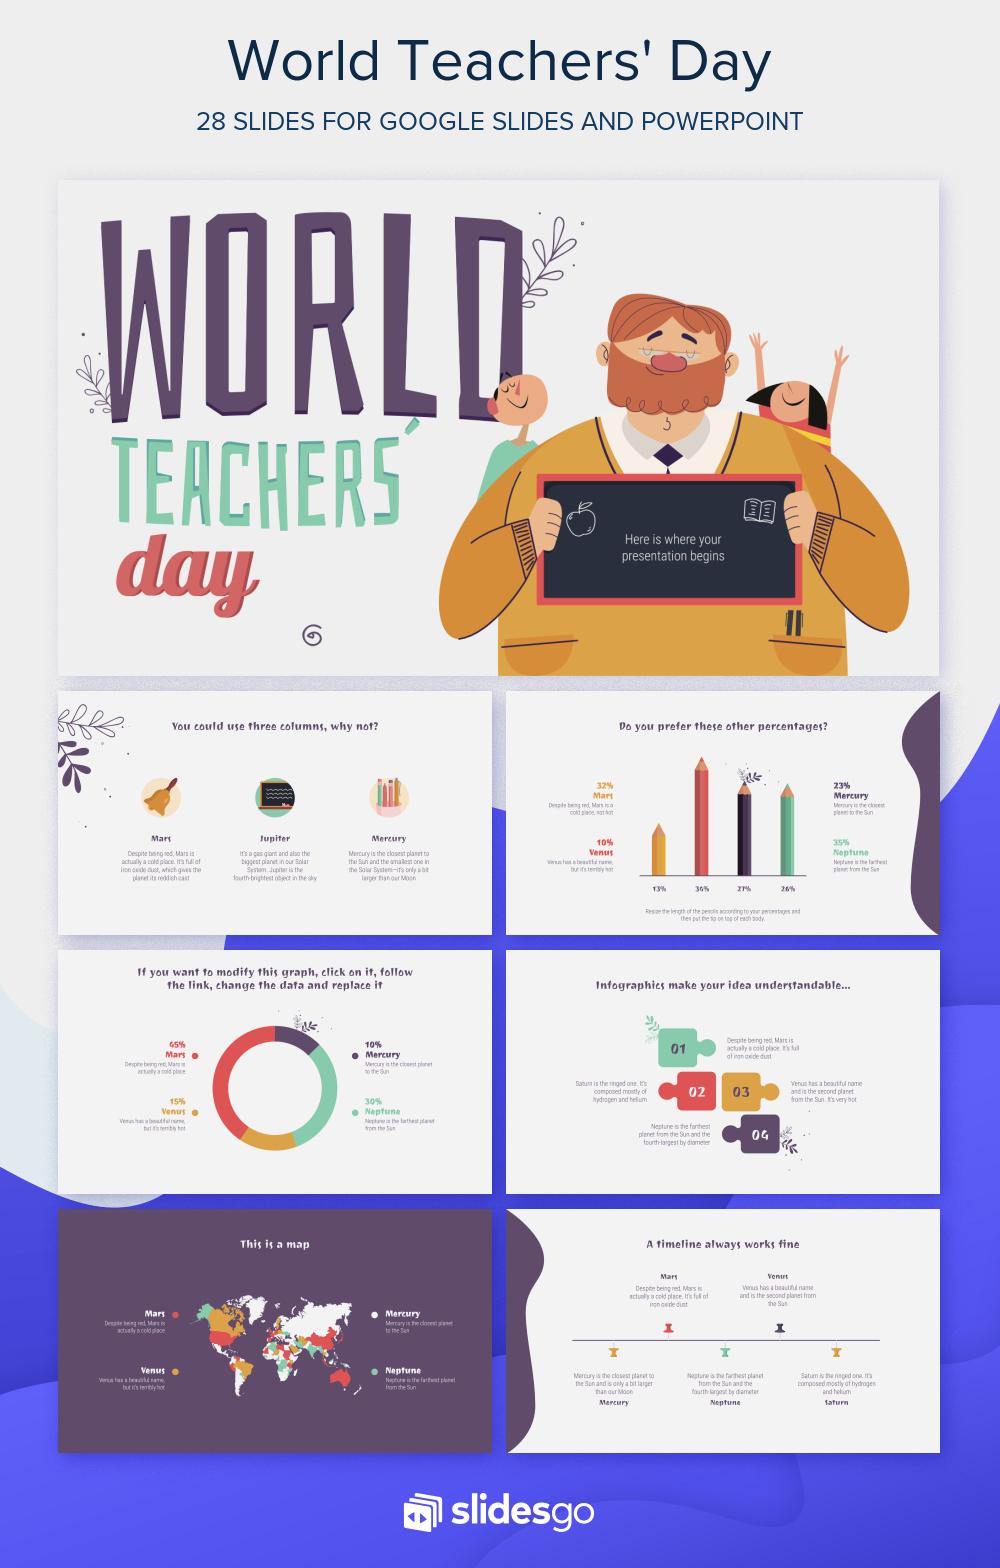 Celebrate World Teachers Day Using This Free Customizable Presentation Template In 2020 World Teachers Teachers Day Teacher